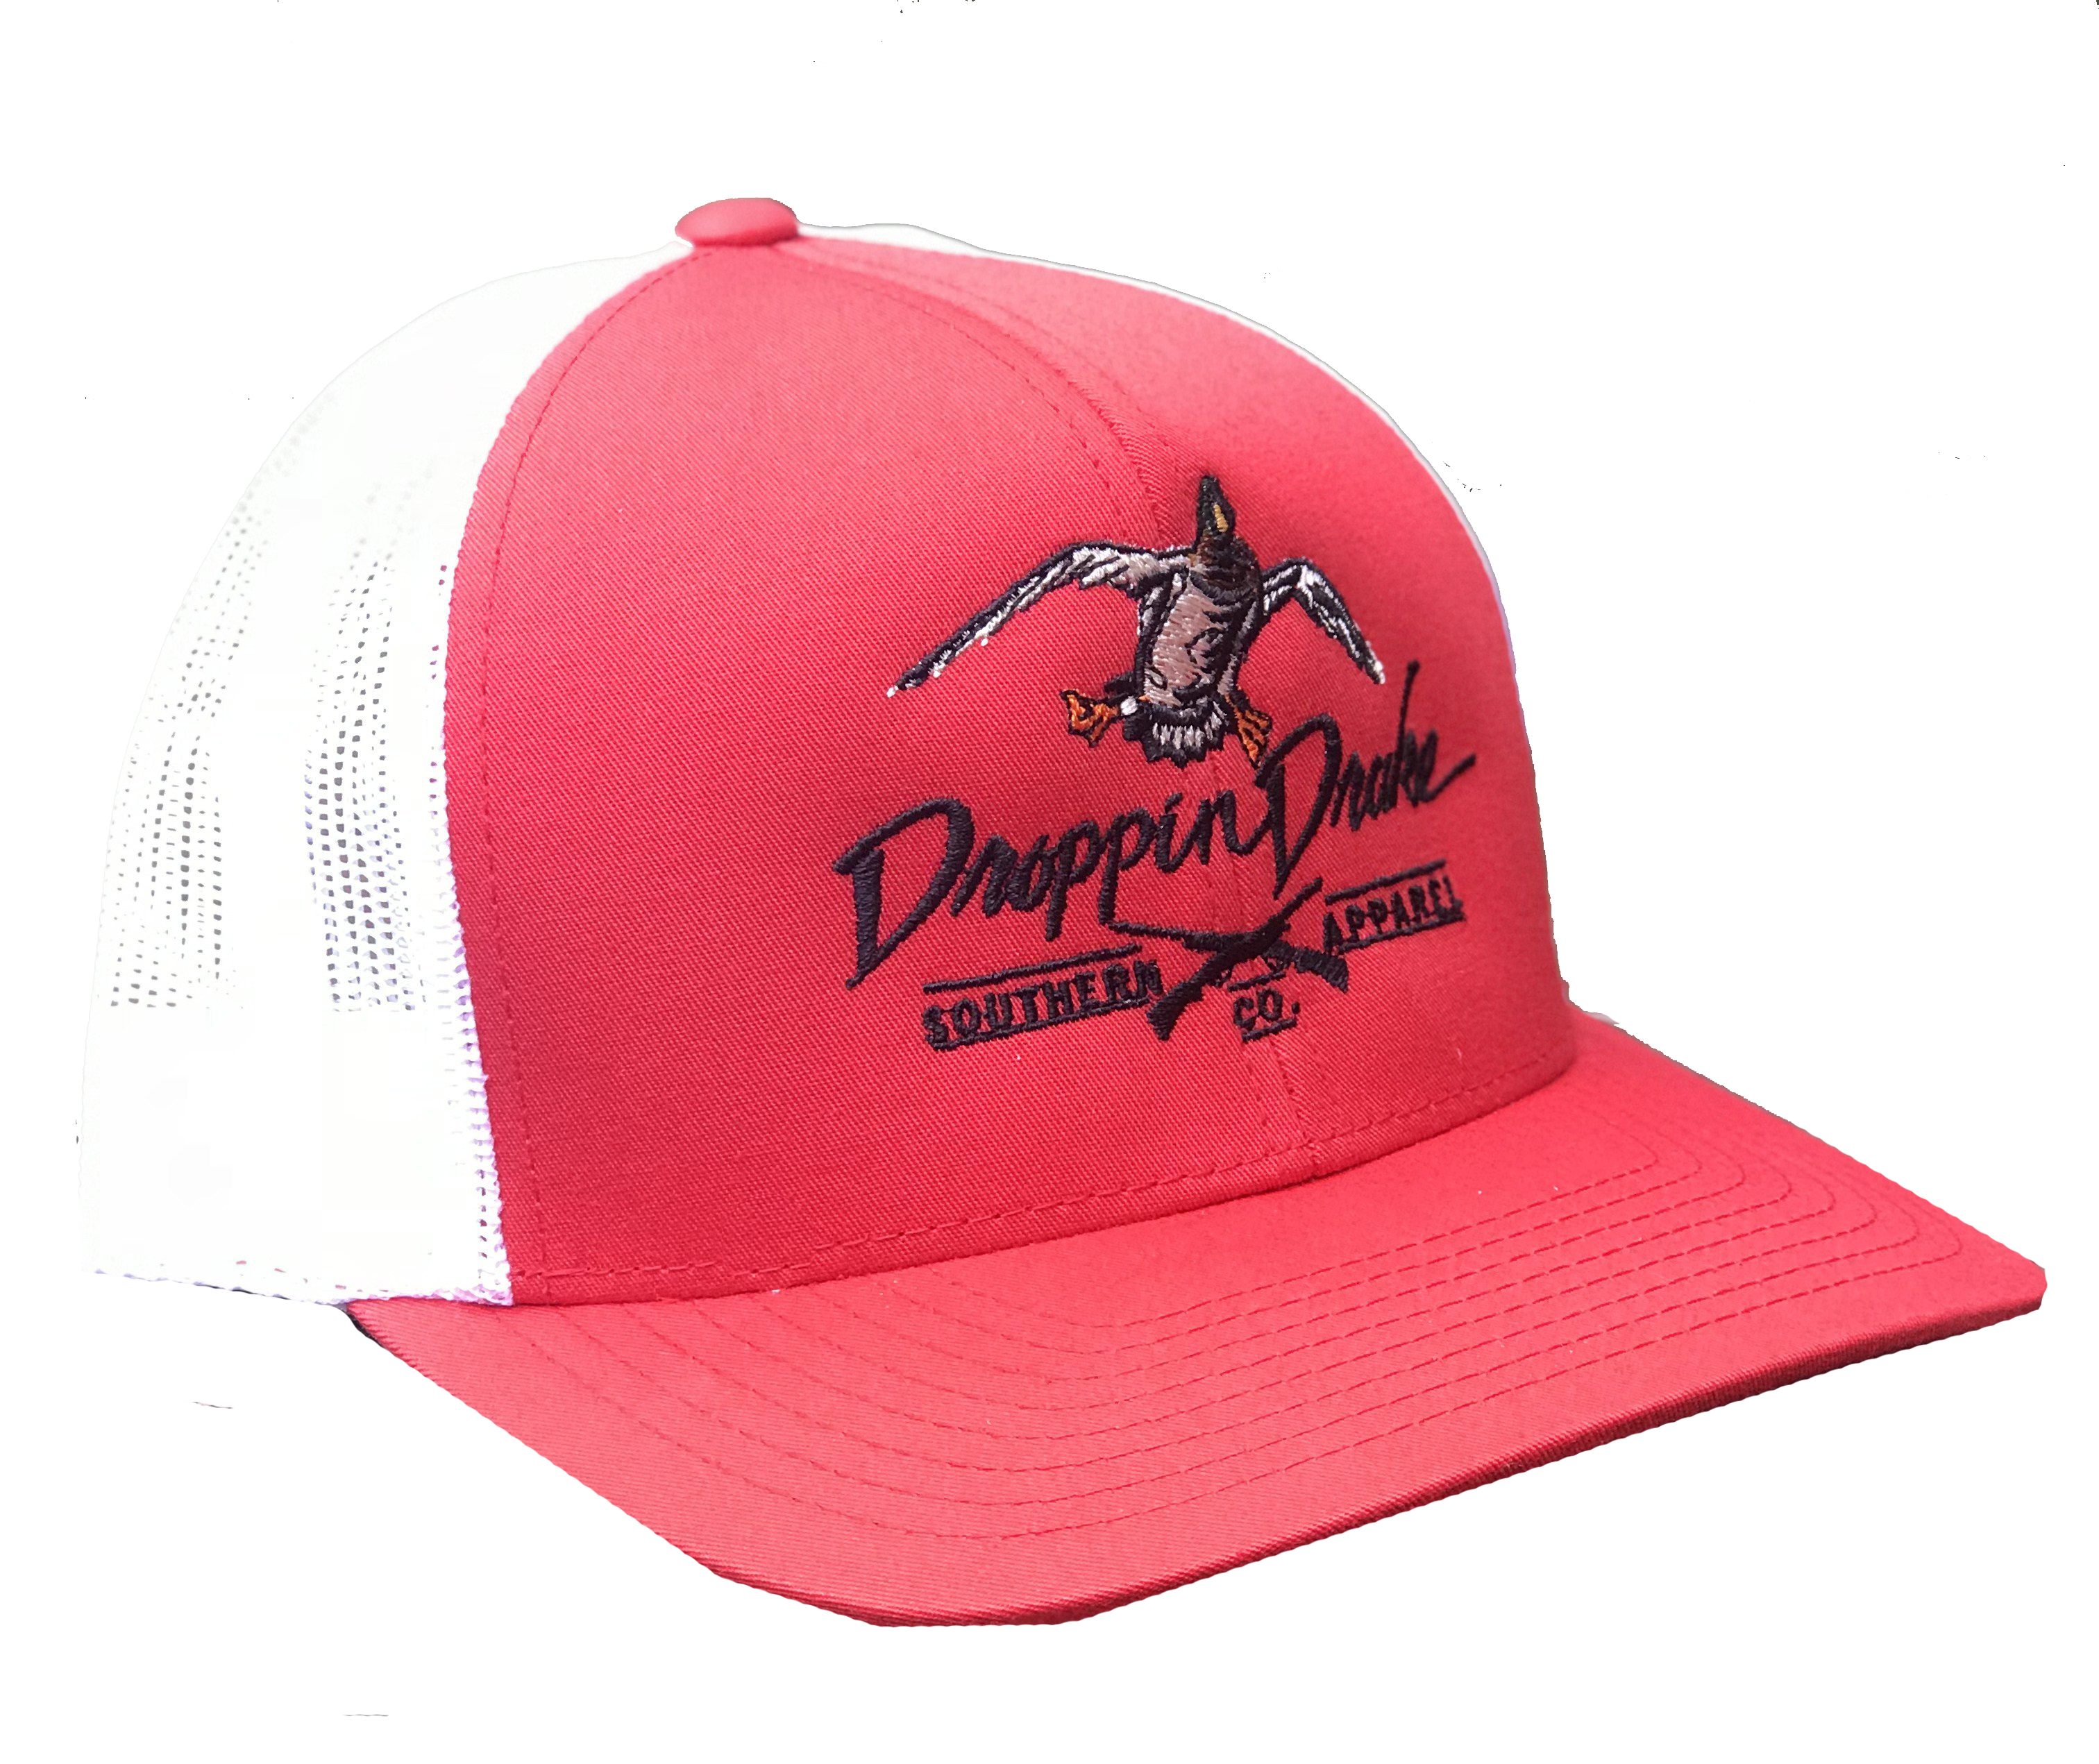 Lightweight Mesh Back Trucker Hat for Unisex Boys and Girls 100/% Polyester White Tiger Mesh Hat